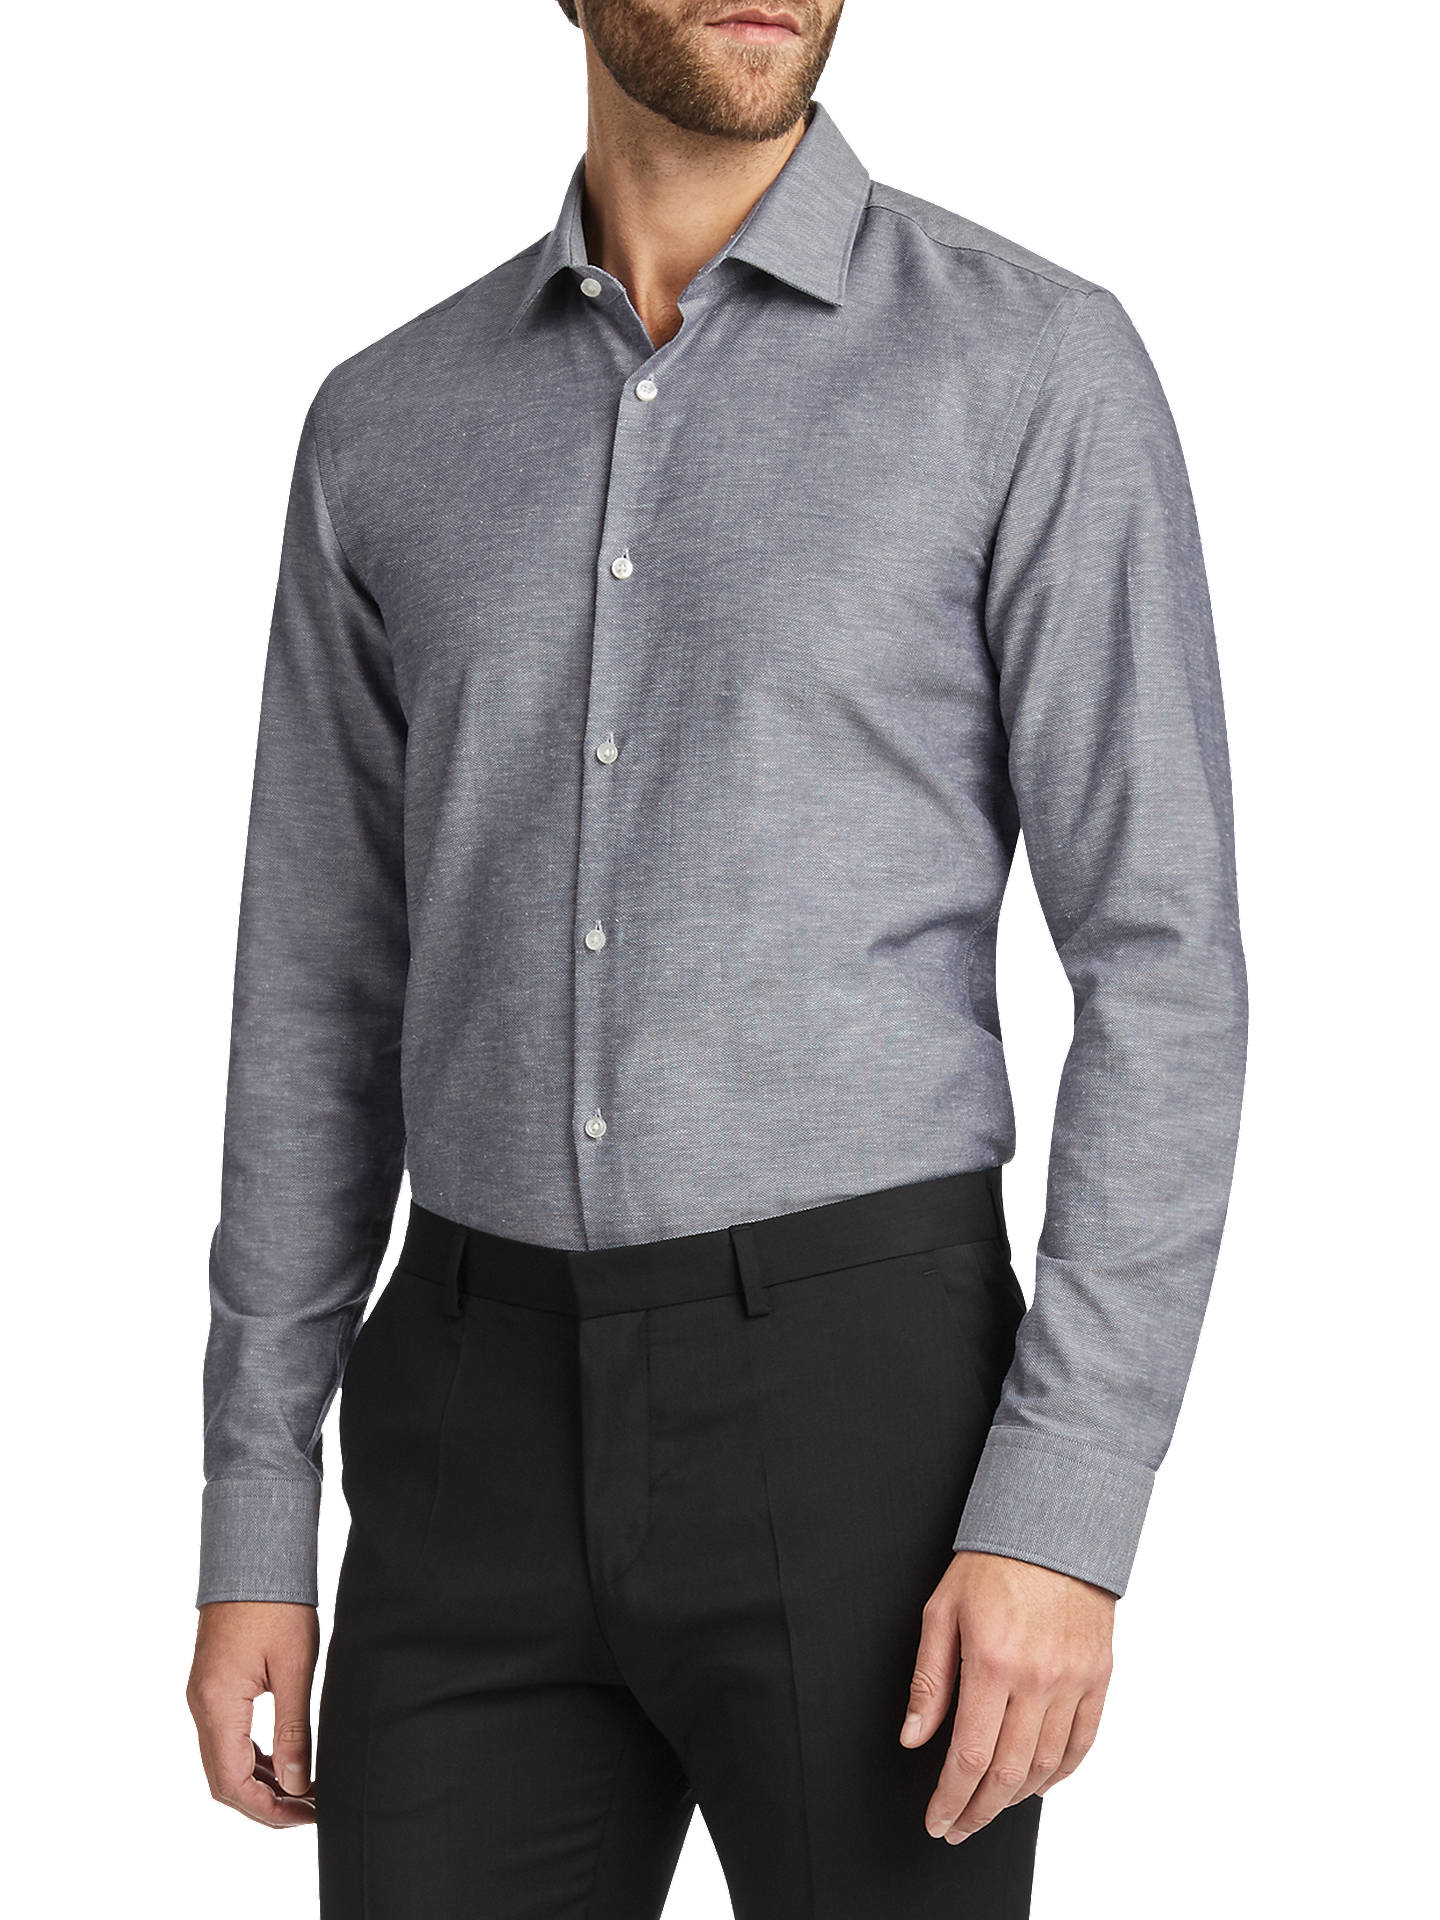 e0db707f3 HUGO by Hugo Boss C-Jenno Slim Fit Shirt, Navy at John Lewis & Partners